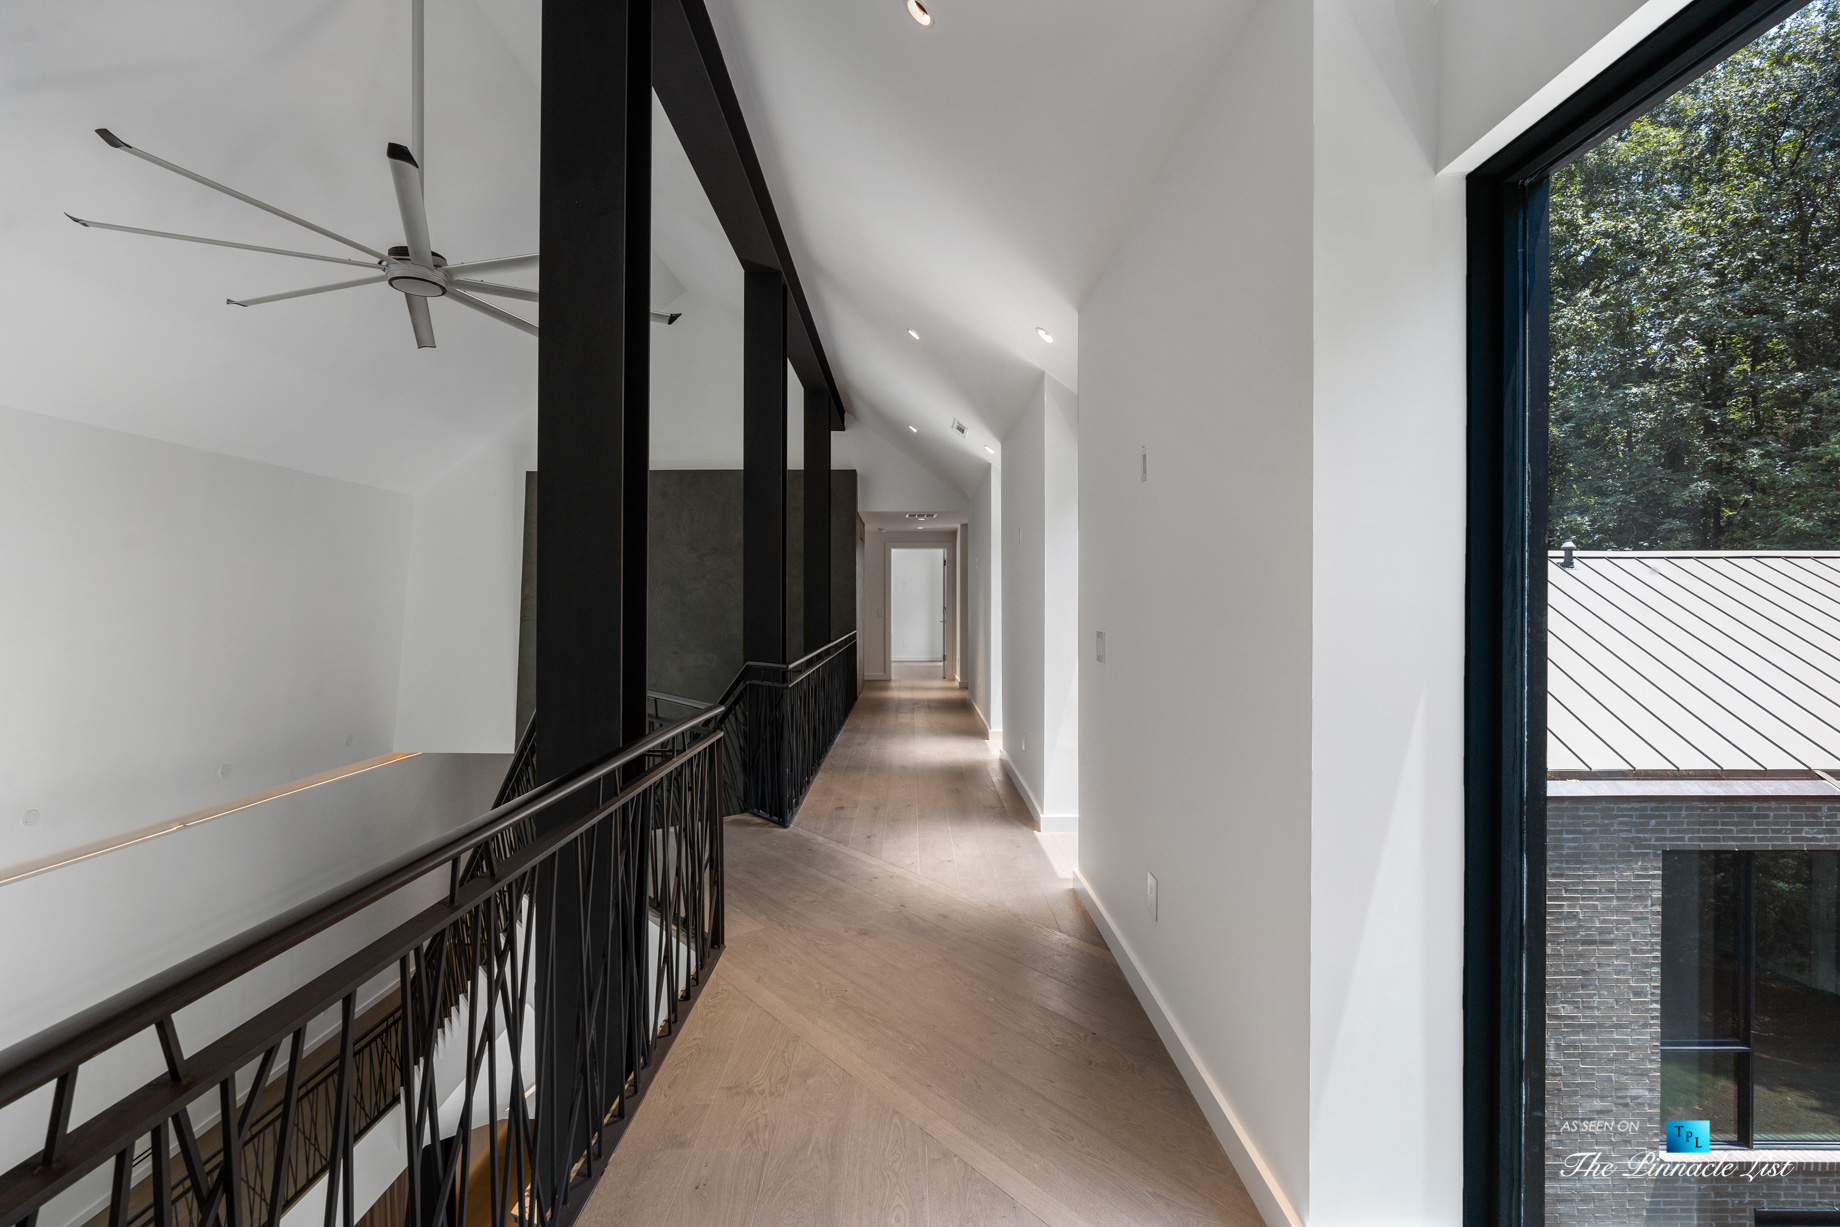 2716 Ridgewood Rd NW, Atlanta, GA, USA - Artistic Stairs - Luxury Real Estate - Modern Contemporary Buckhead Home